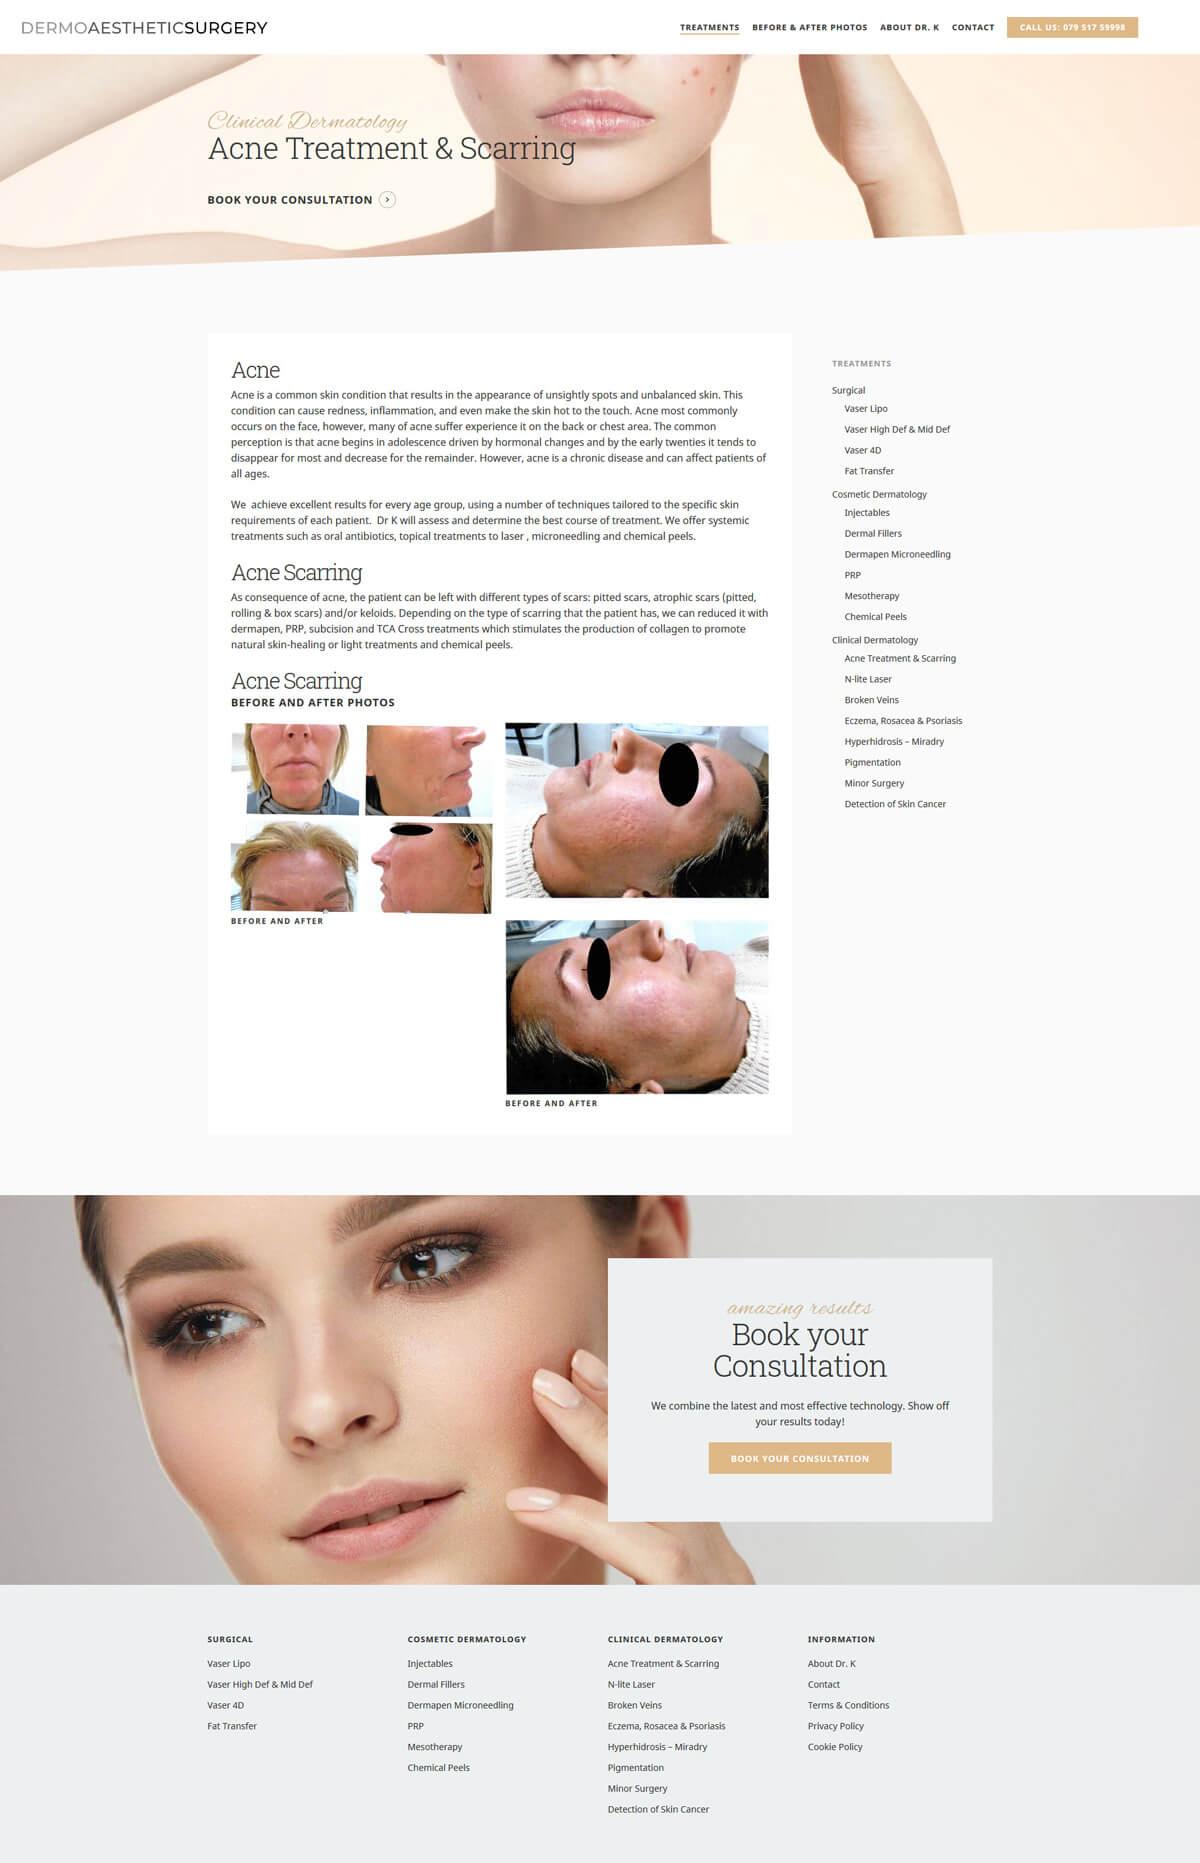 Dermo Aesthetic Surgery - dermoaestheticsurgery.com - Case Study 5 - developed by Digital Artifacts Creative